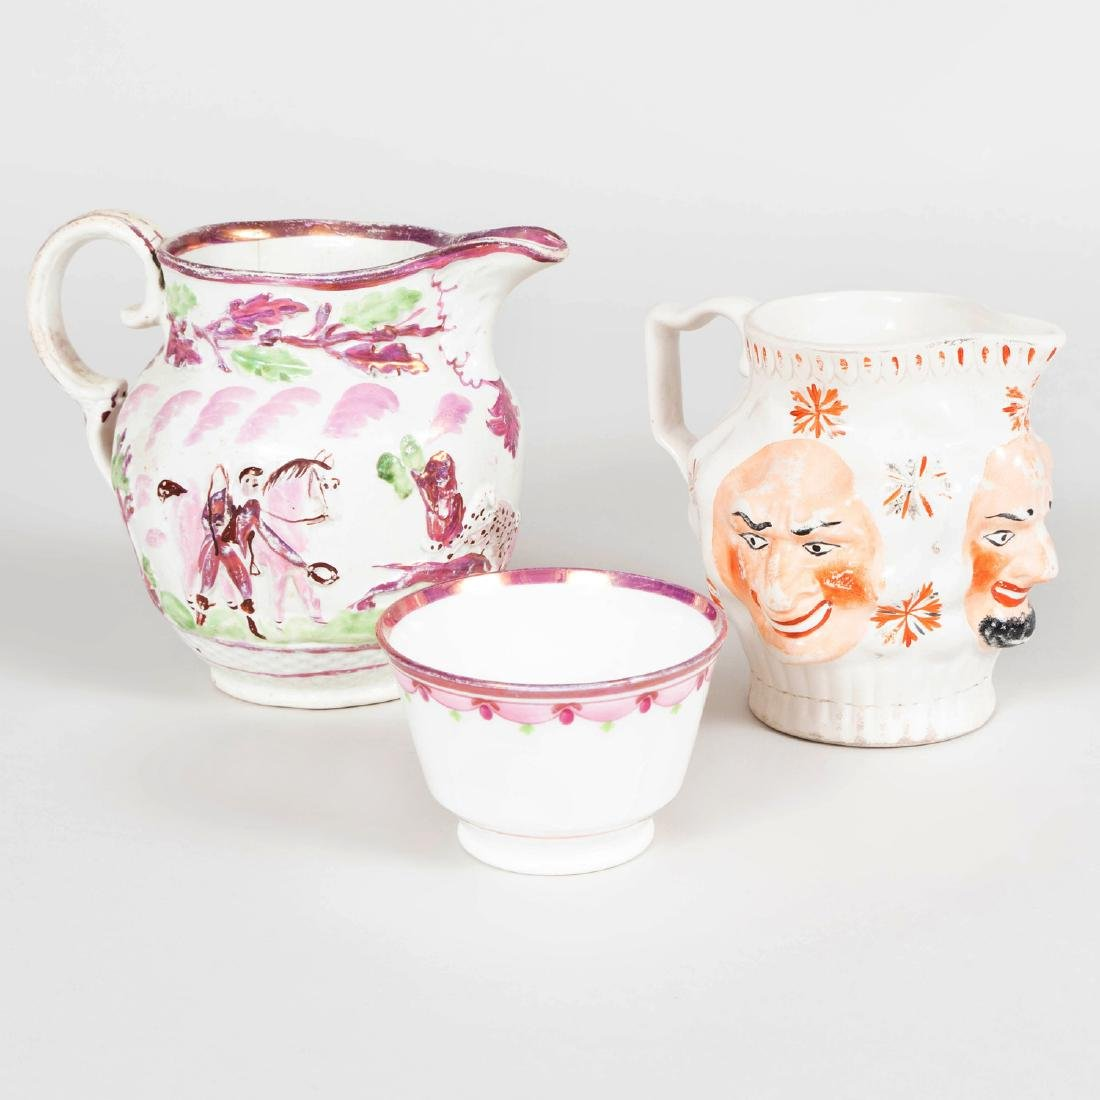 English Porcelain Face Jug, a Lusterware Porcelain Jug